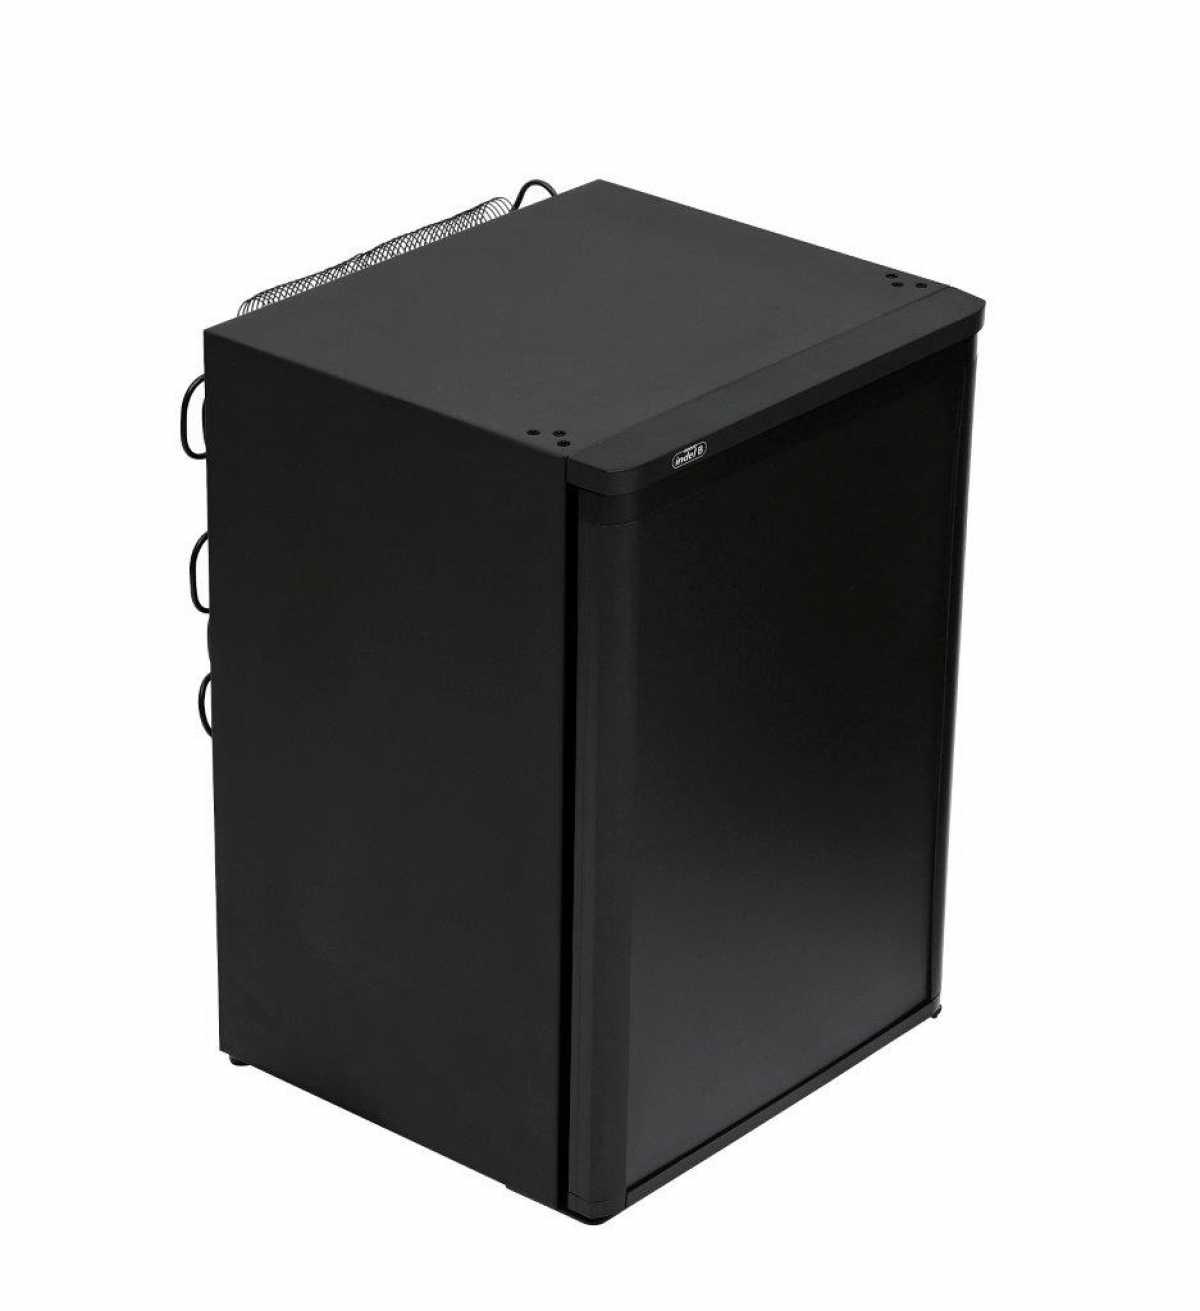 INDEL B K 35 Ecosmart Minibar